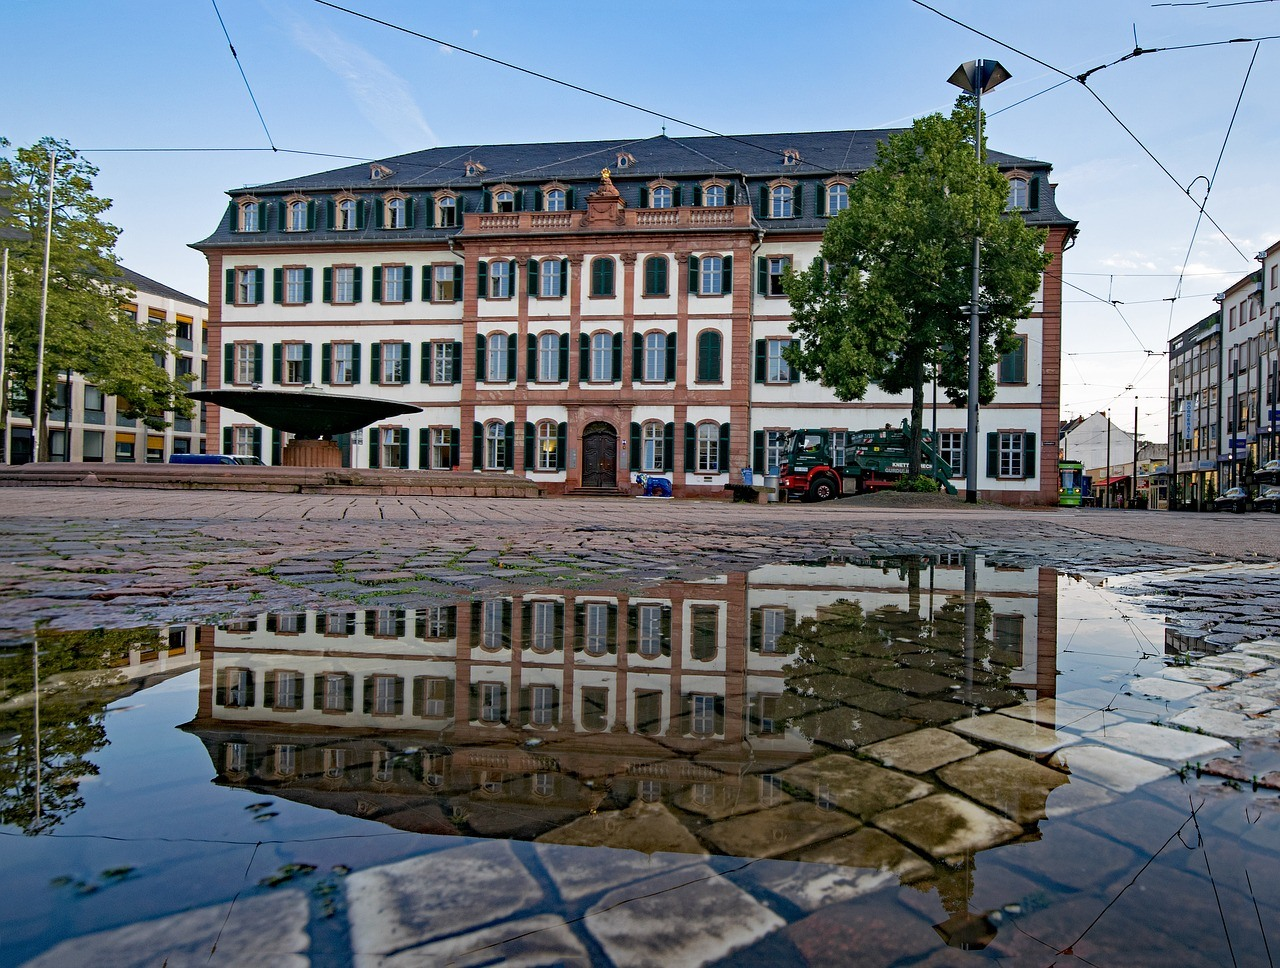 Regierungspräsidium Darmstadt, Pfütze, Gebäude